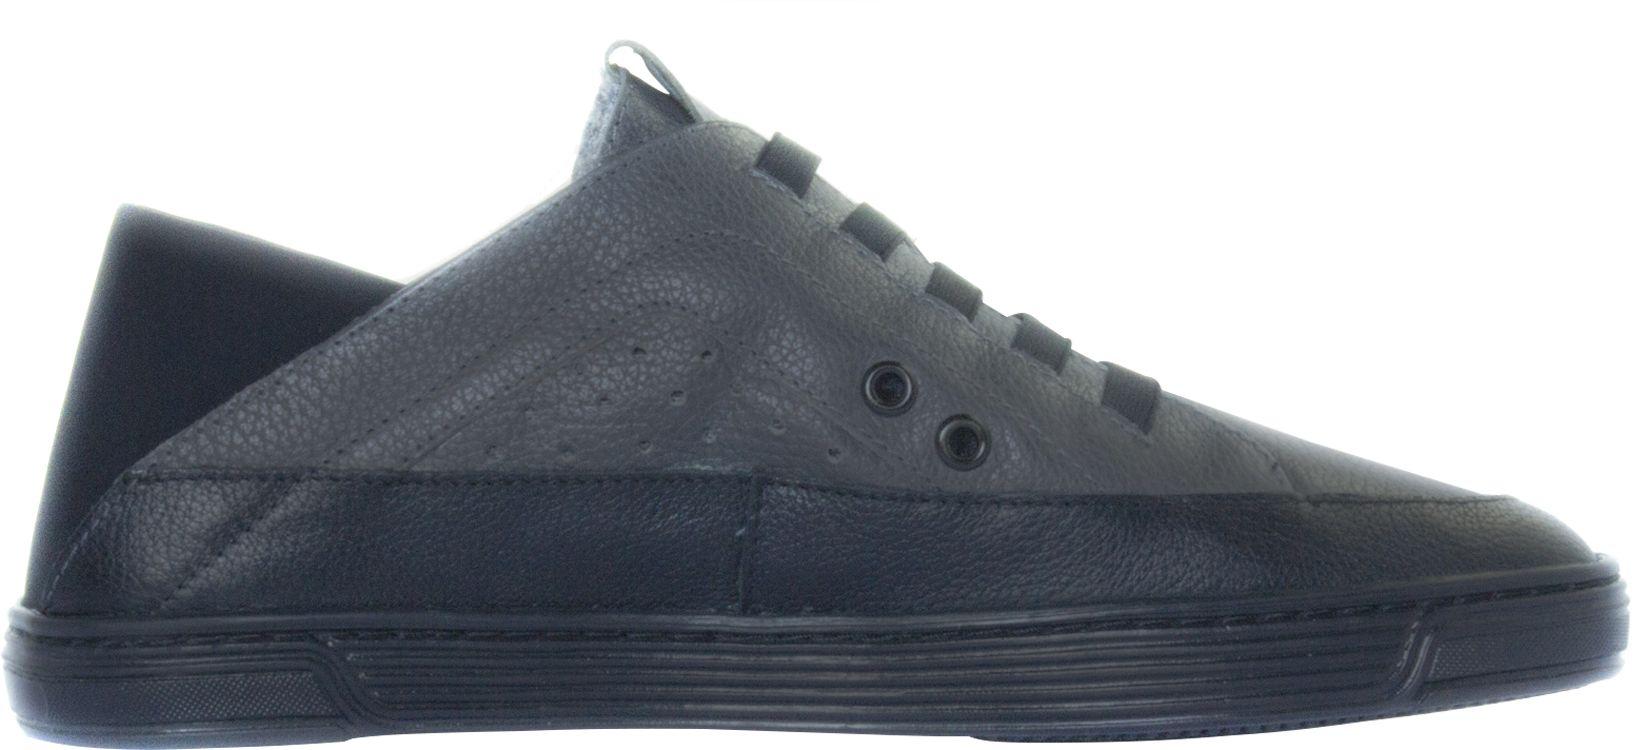 FOOTWEAR - Low-tops & sneakers Natural World CjyKn